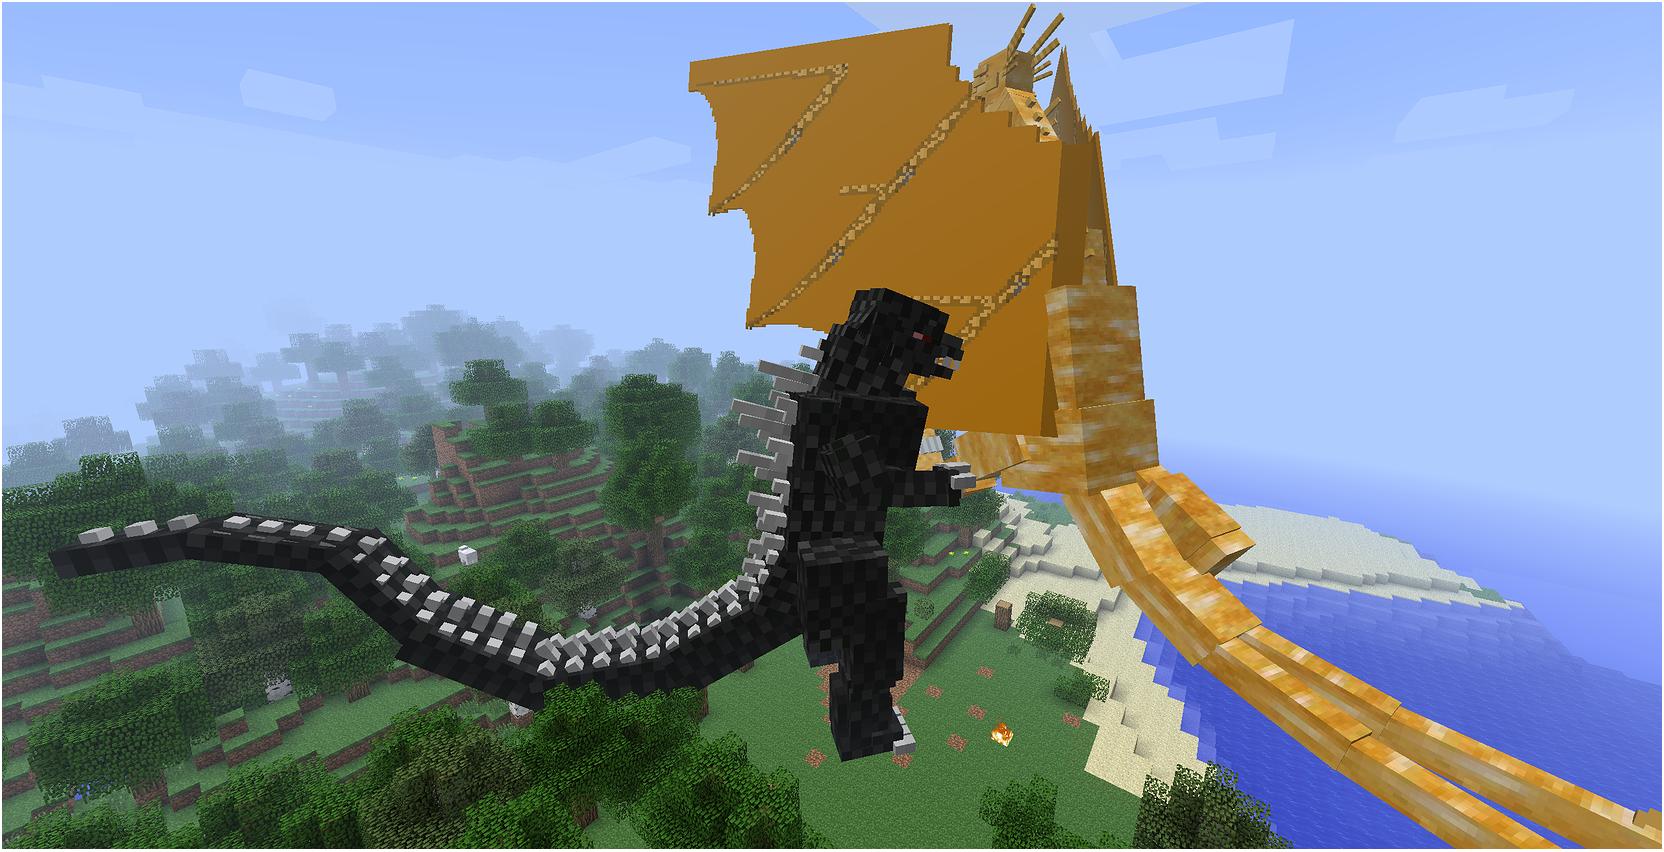 Minecraft Godzilla Mod Installer 10.10.10!  Voidswrath  Godzilla